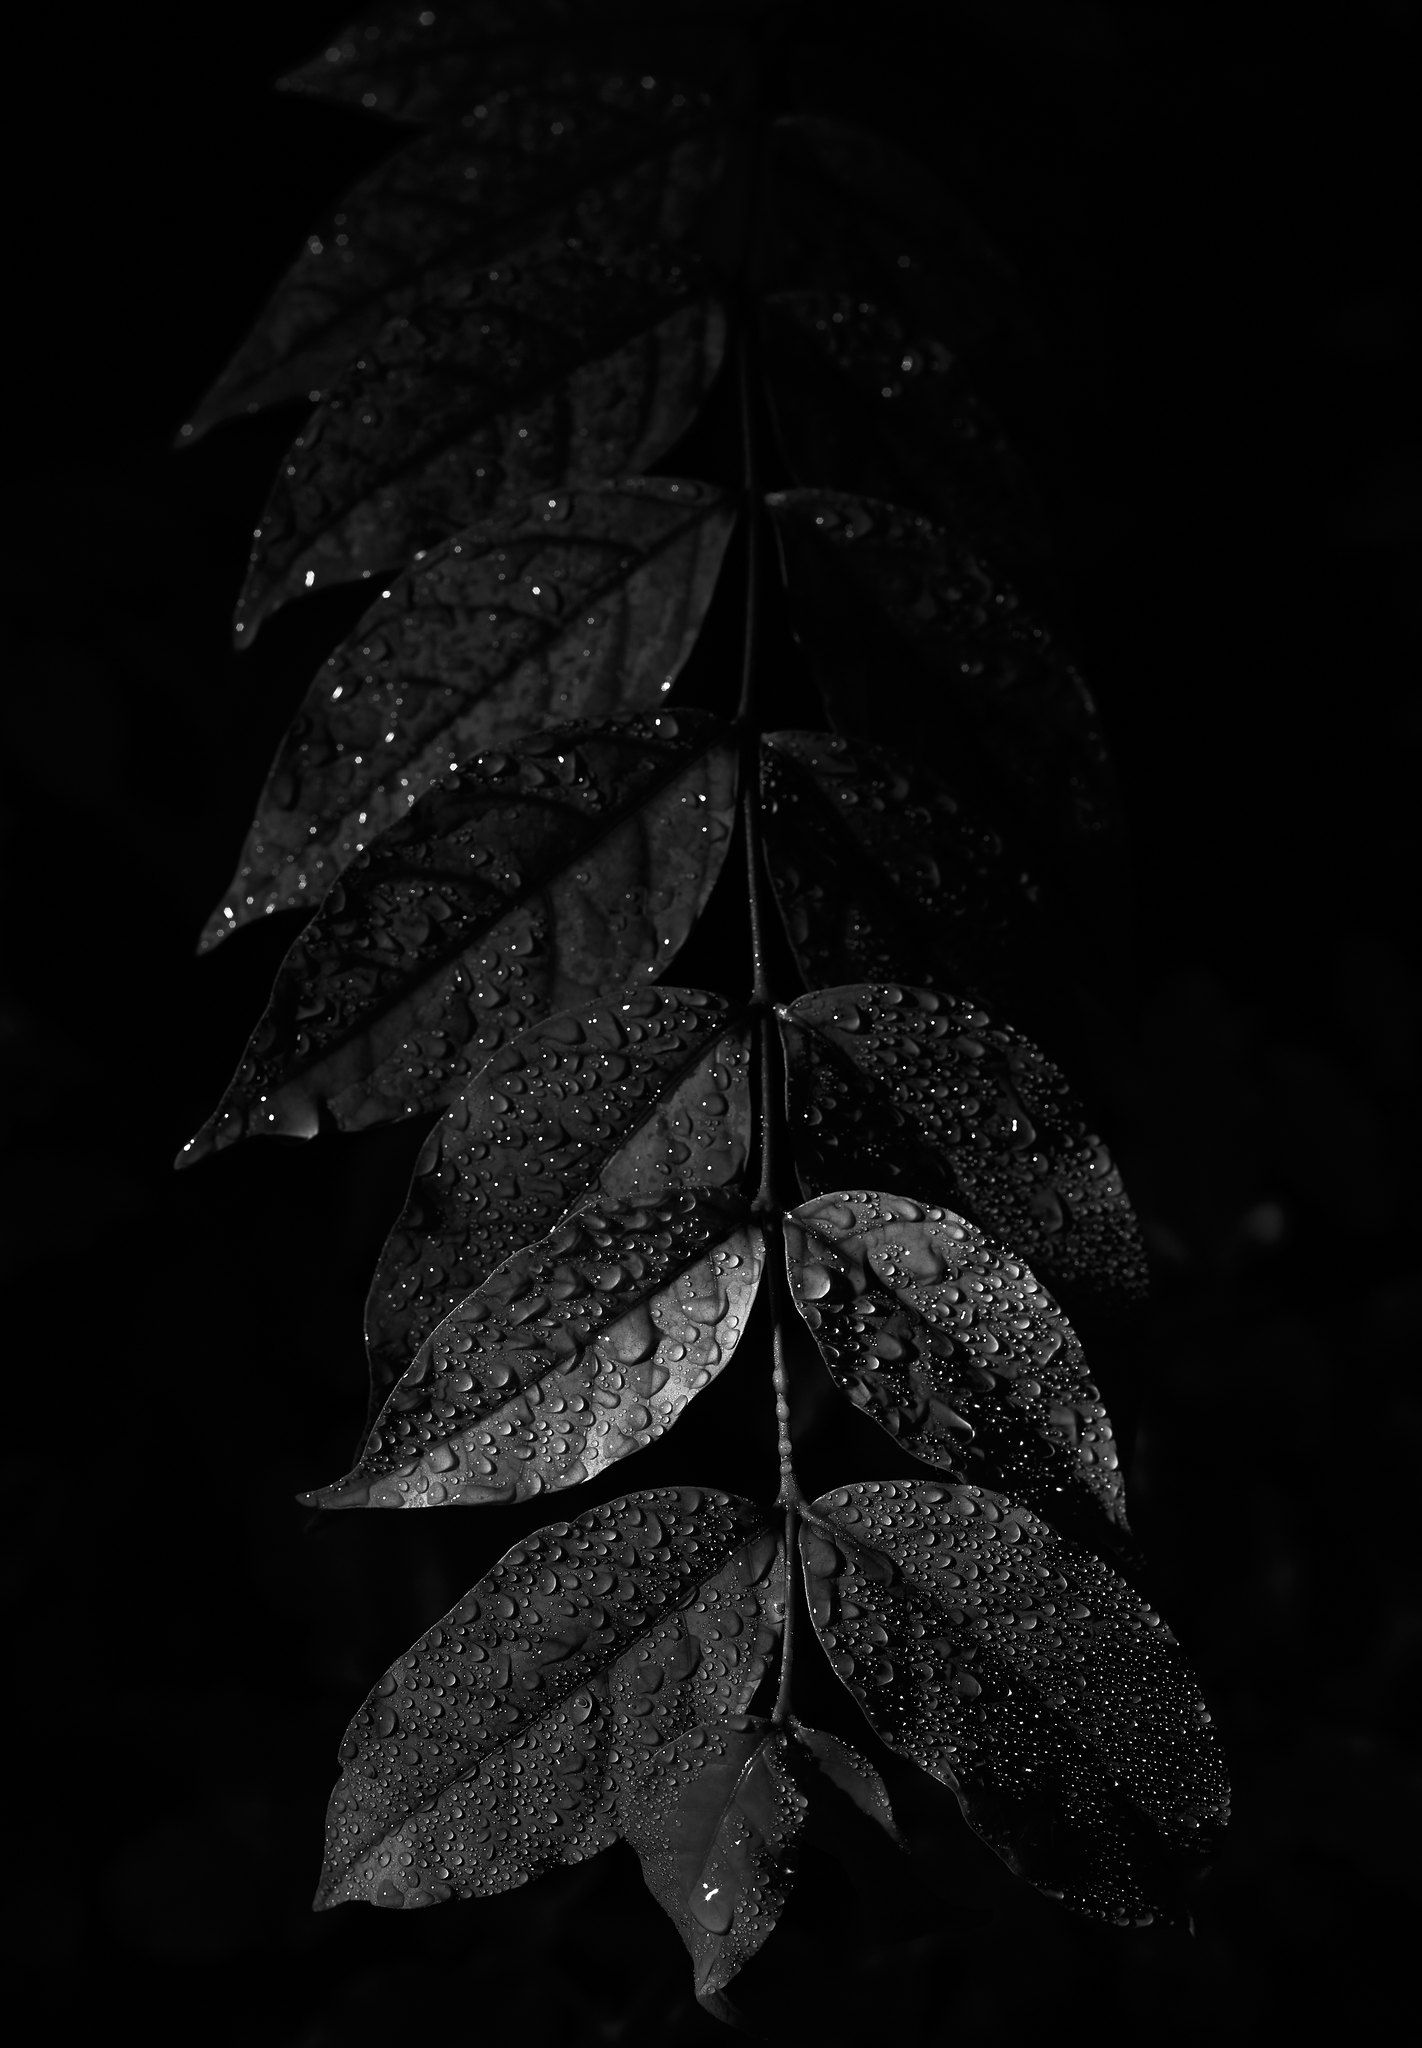 Leaf Black And White Leaves Black Aethstetic Background Black Aesthetic Wallpaper Aesthetic dark leaf wallpaper